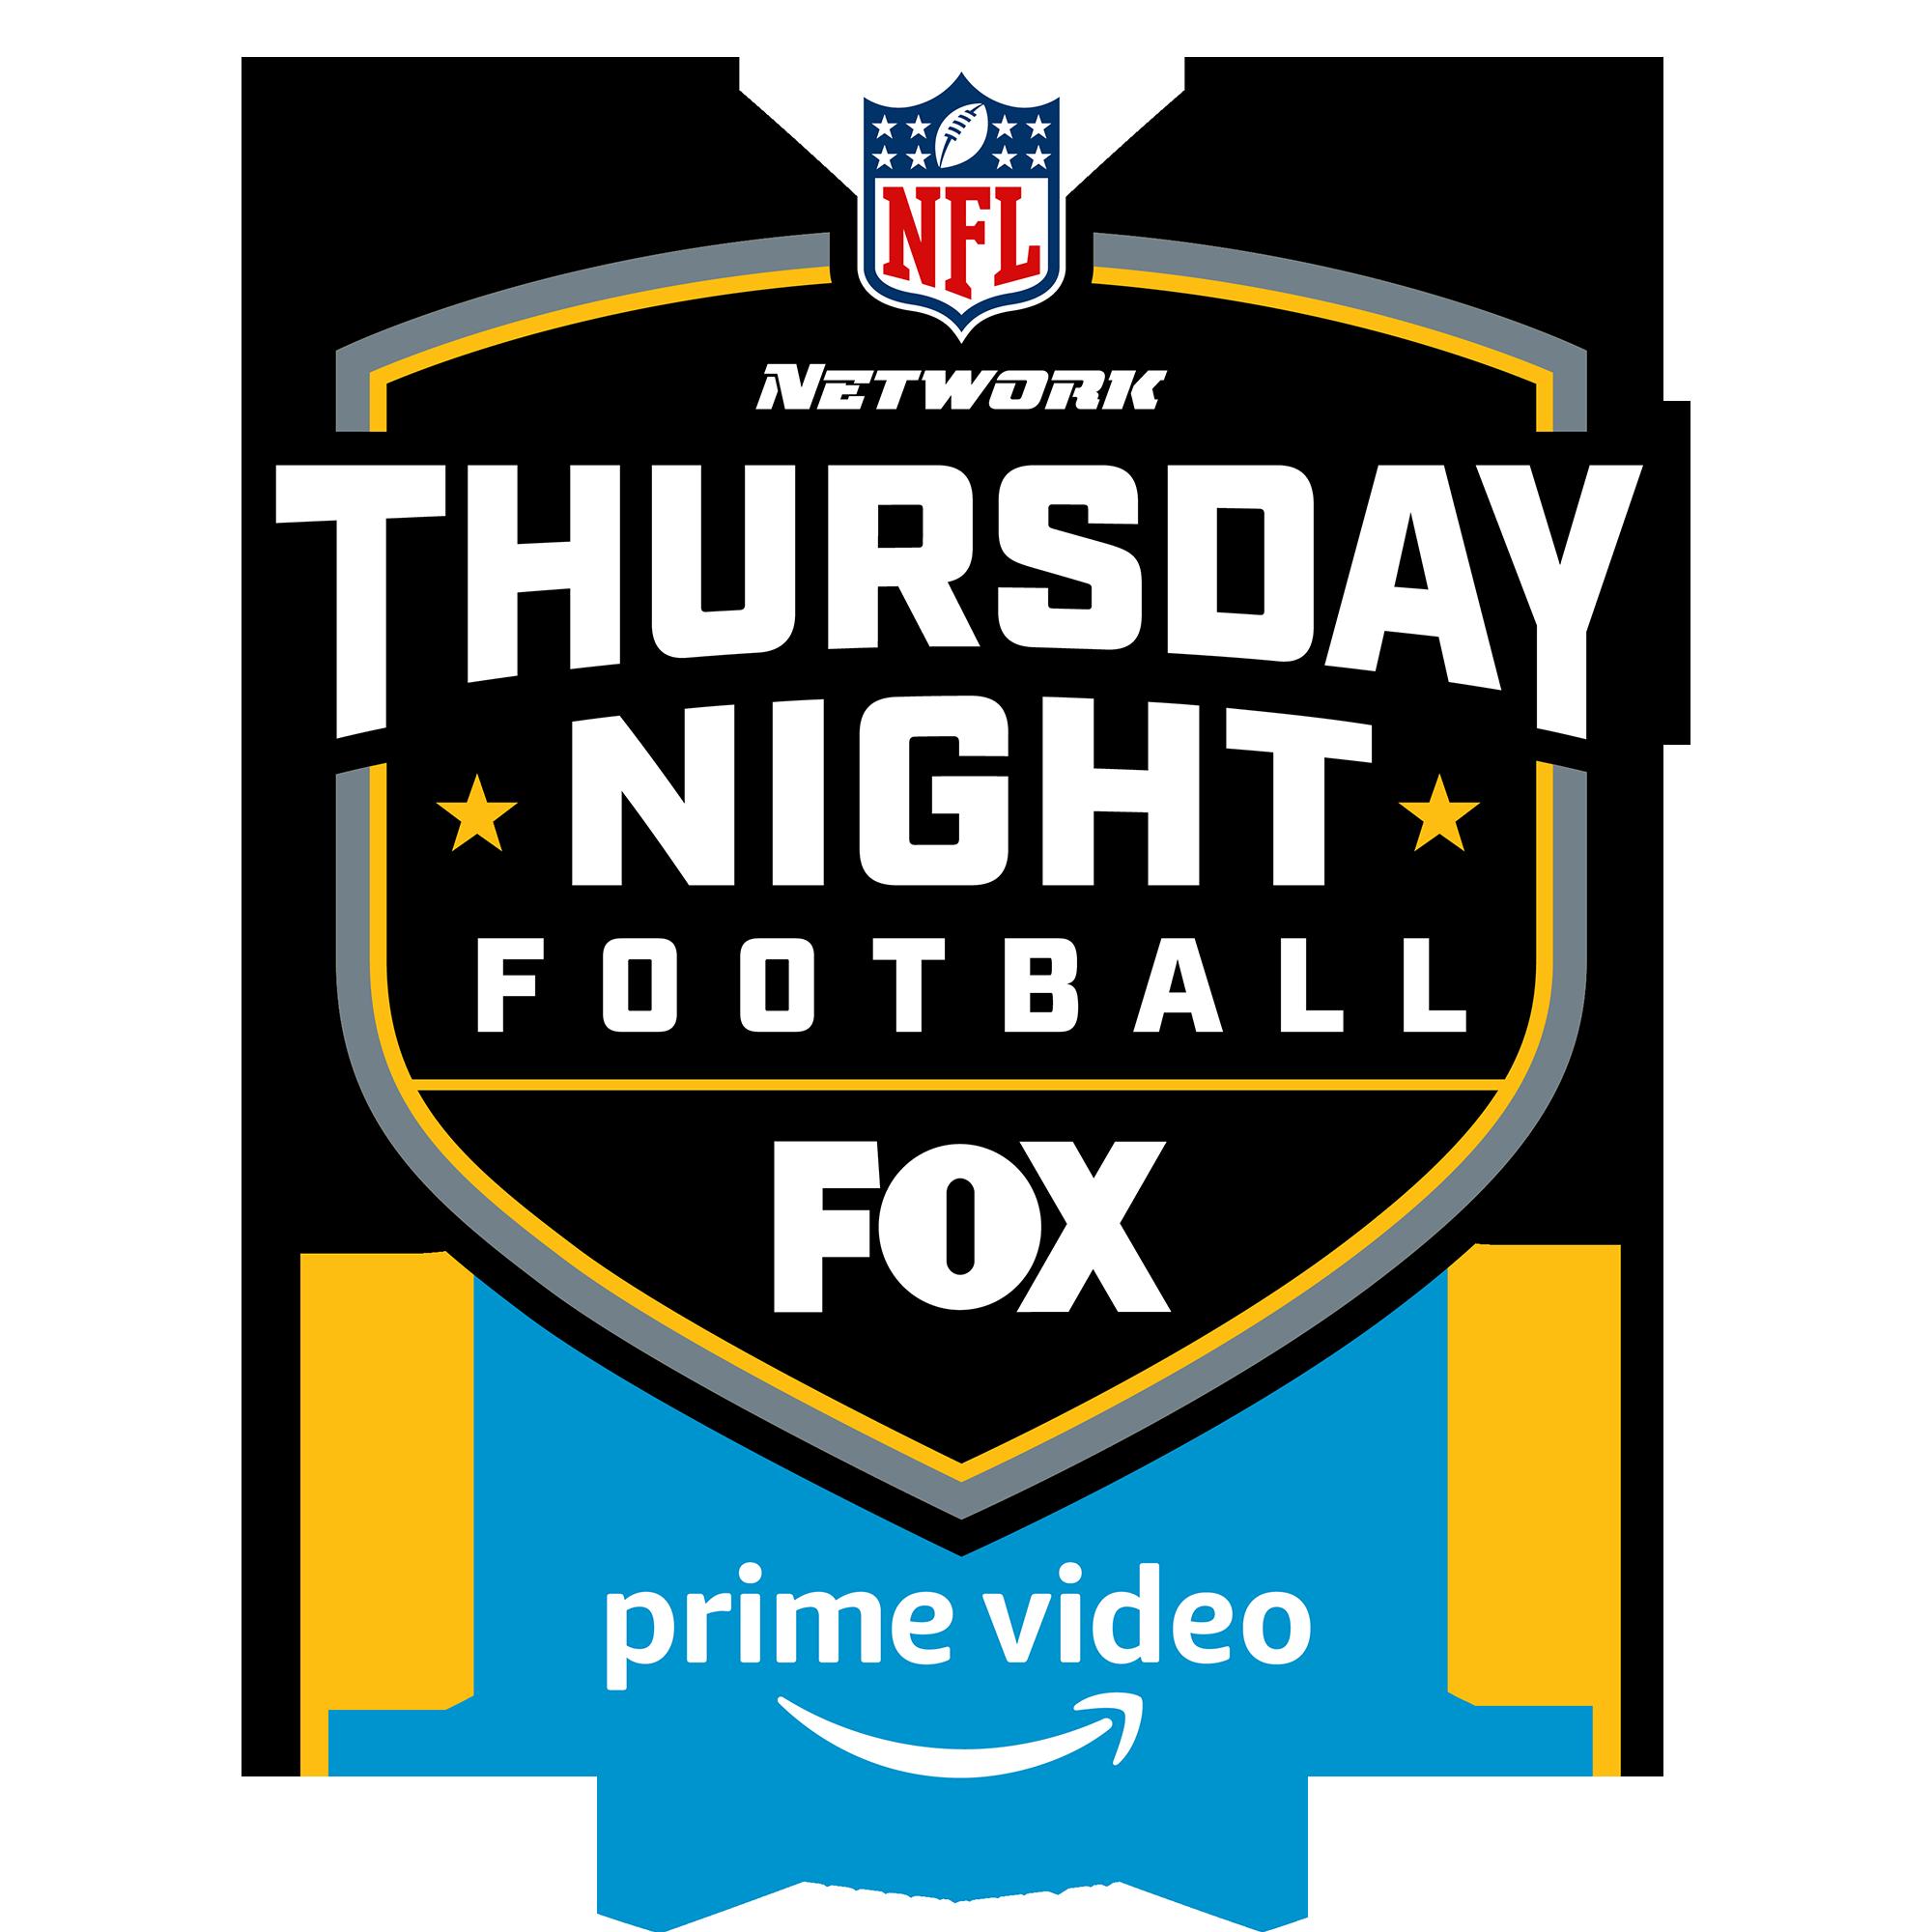 Nfl 2020 Week 1 Schedule Nfl Com Thursday Night Football Nfl Thursday Night Football Football Today